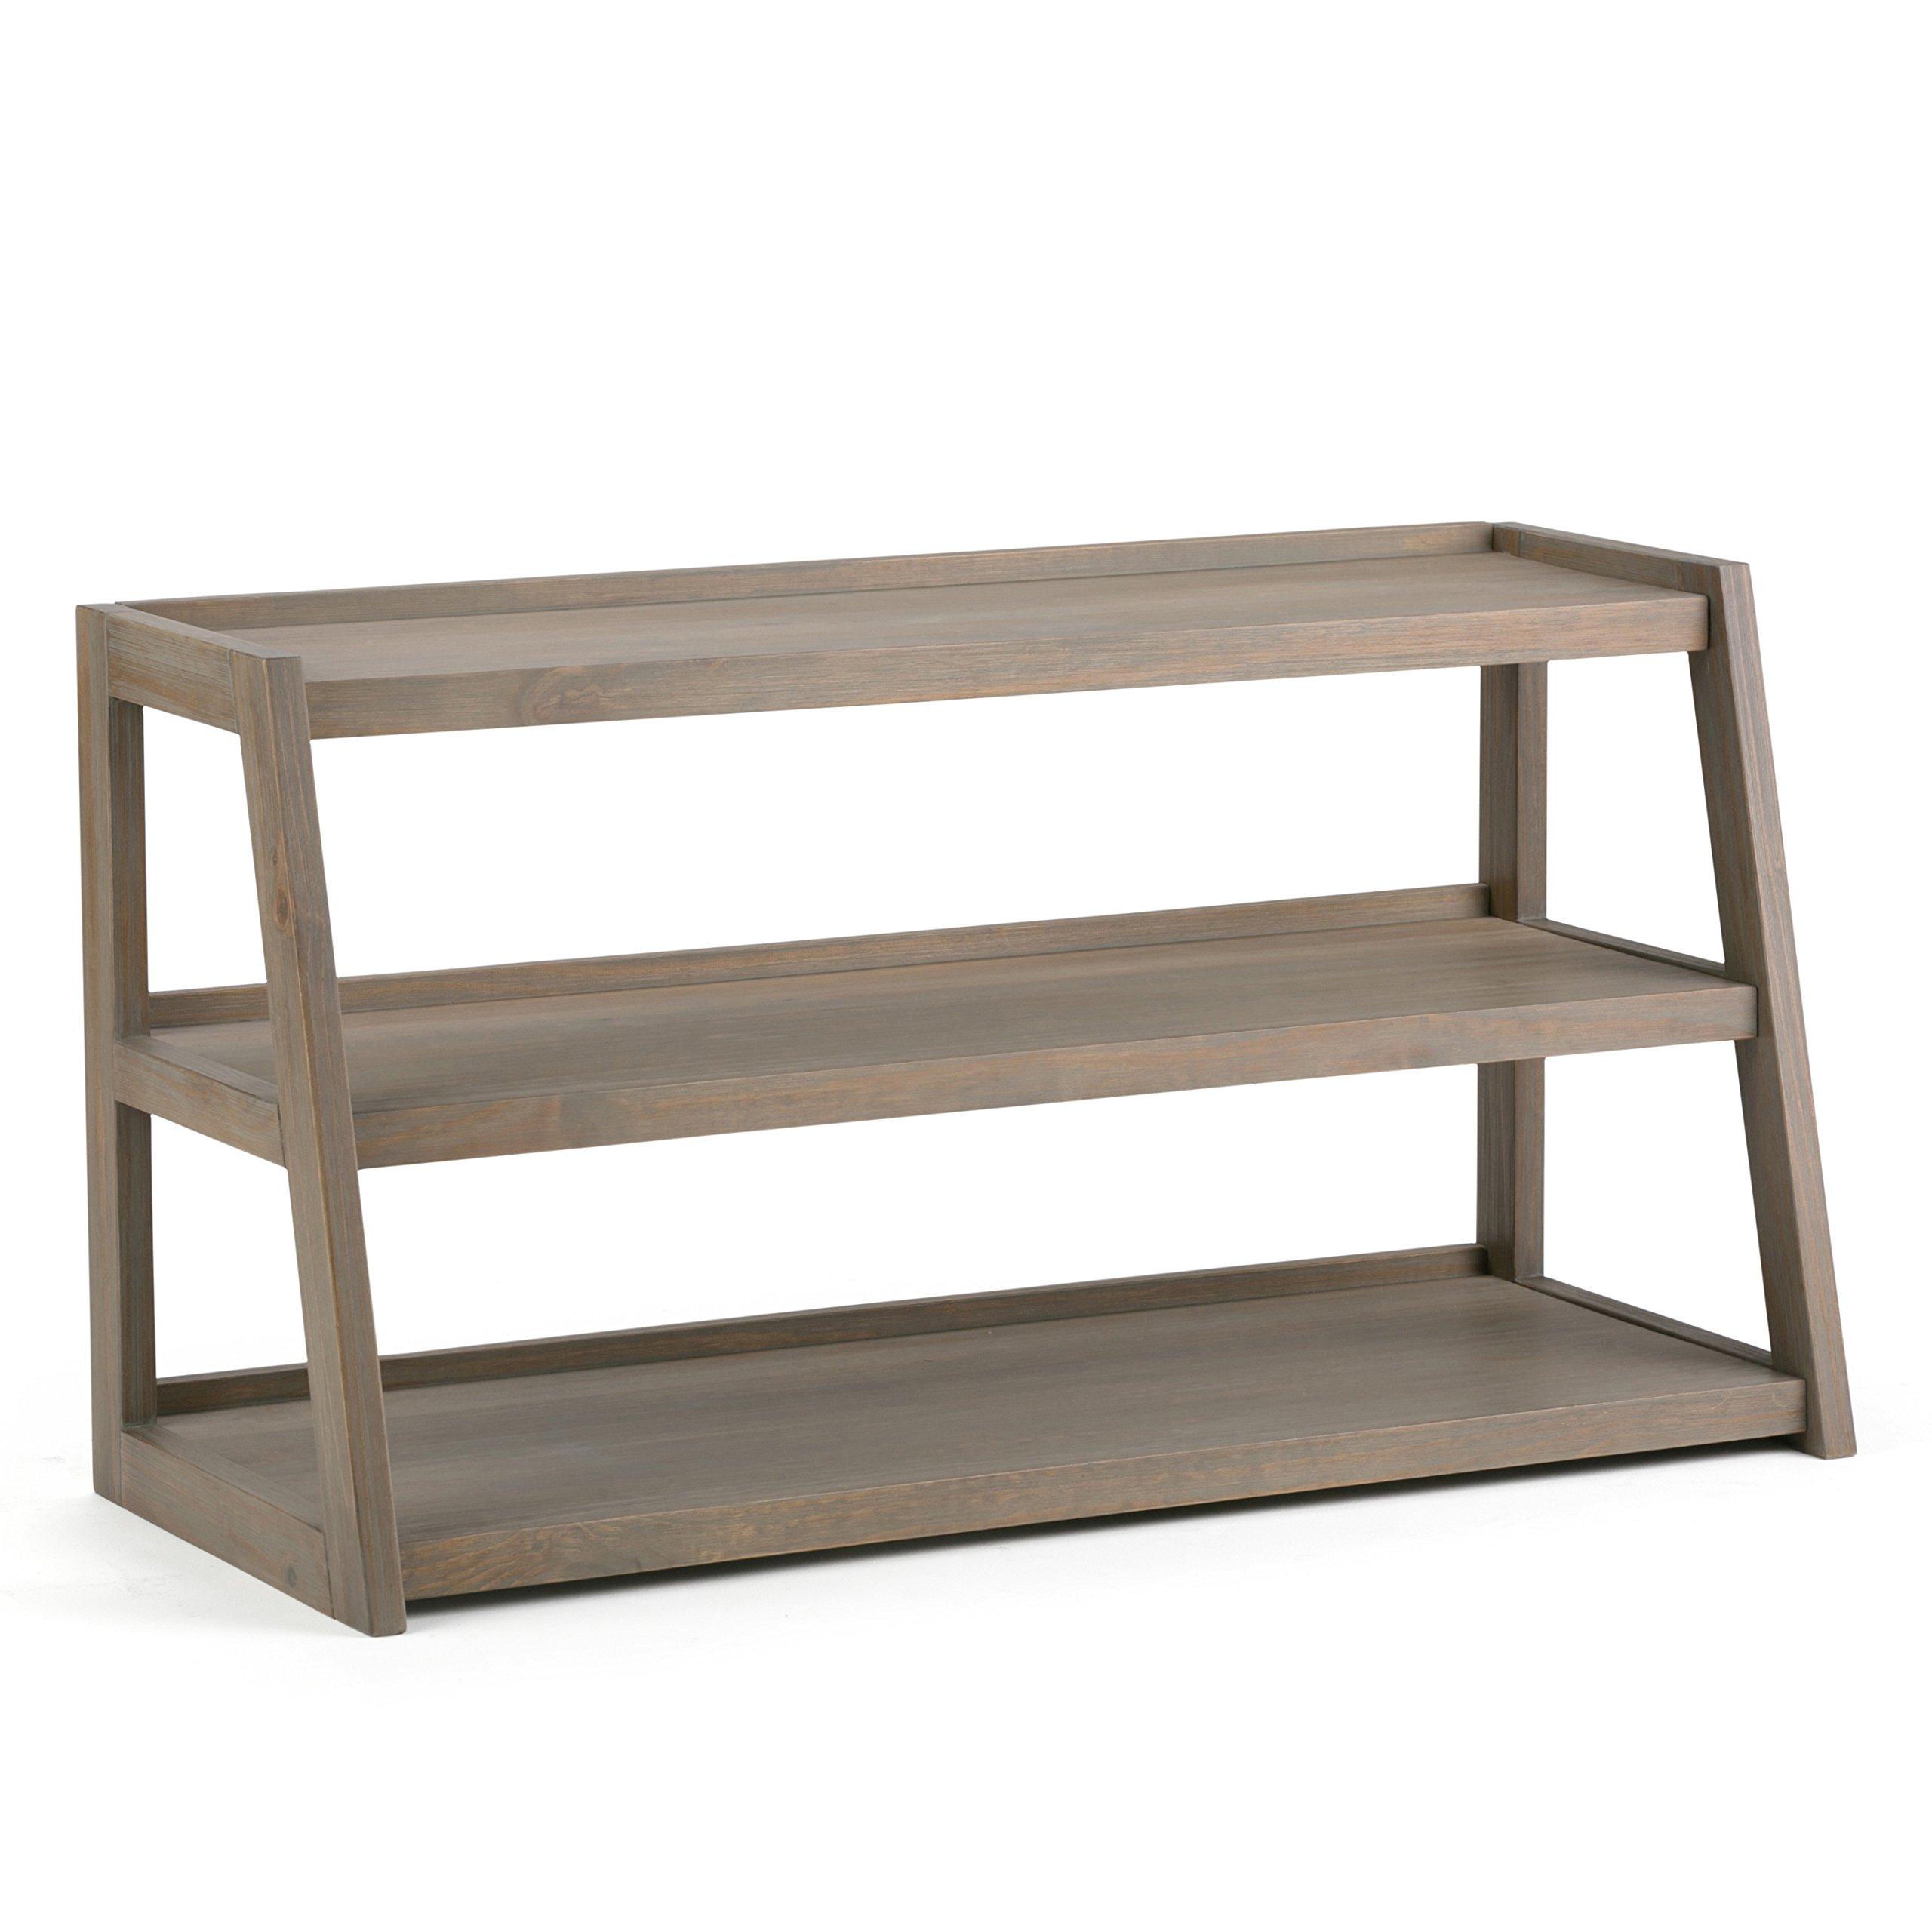 Simpli Home Sawhorse Solid Wood TV Media Stand, Distressed Grey